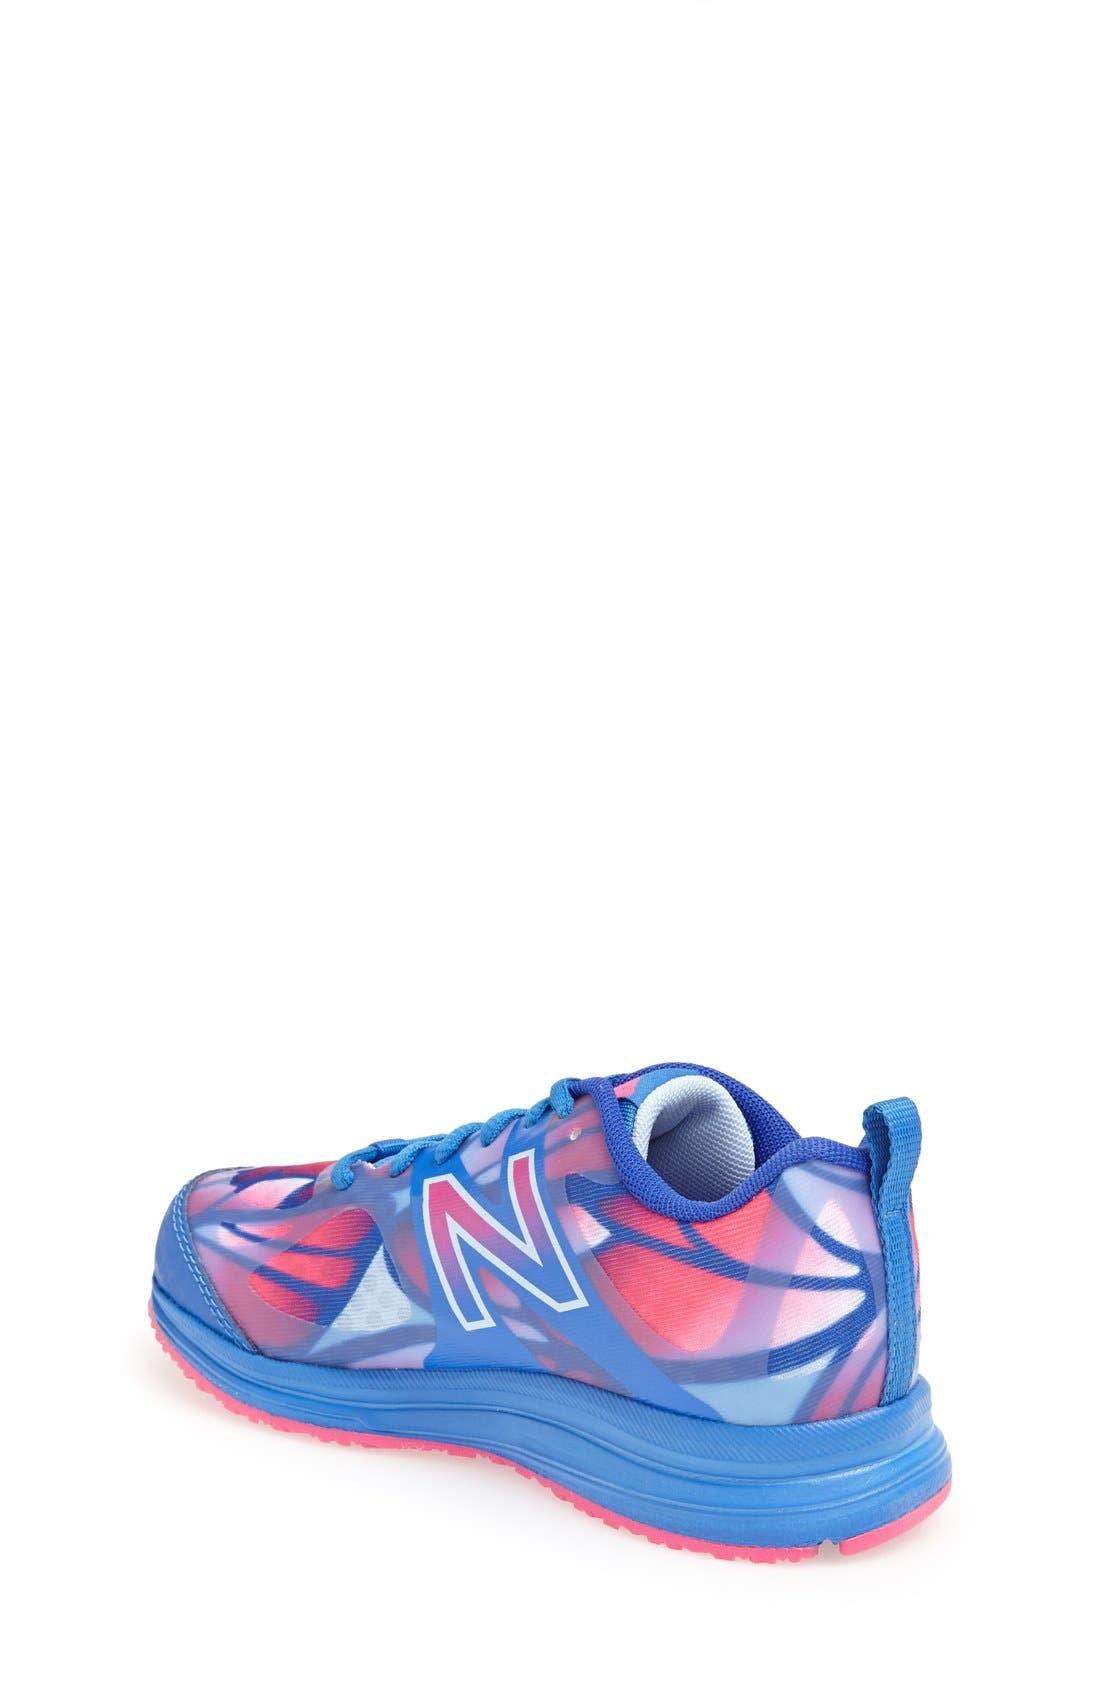 Alternate Image 2  - New Balance 'Update 890 Beetles & Butterfly' Athletic Shoe (Toddler, Little Kid & Big Kid)